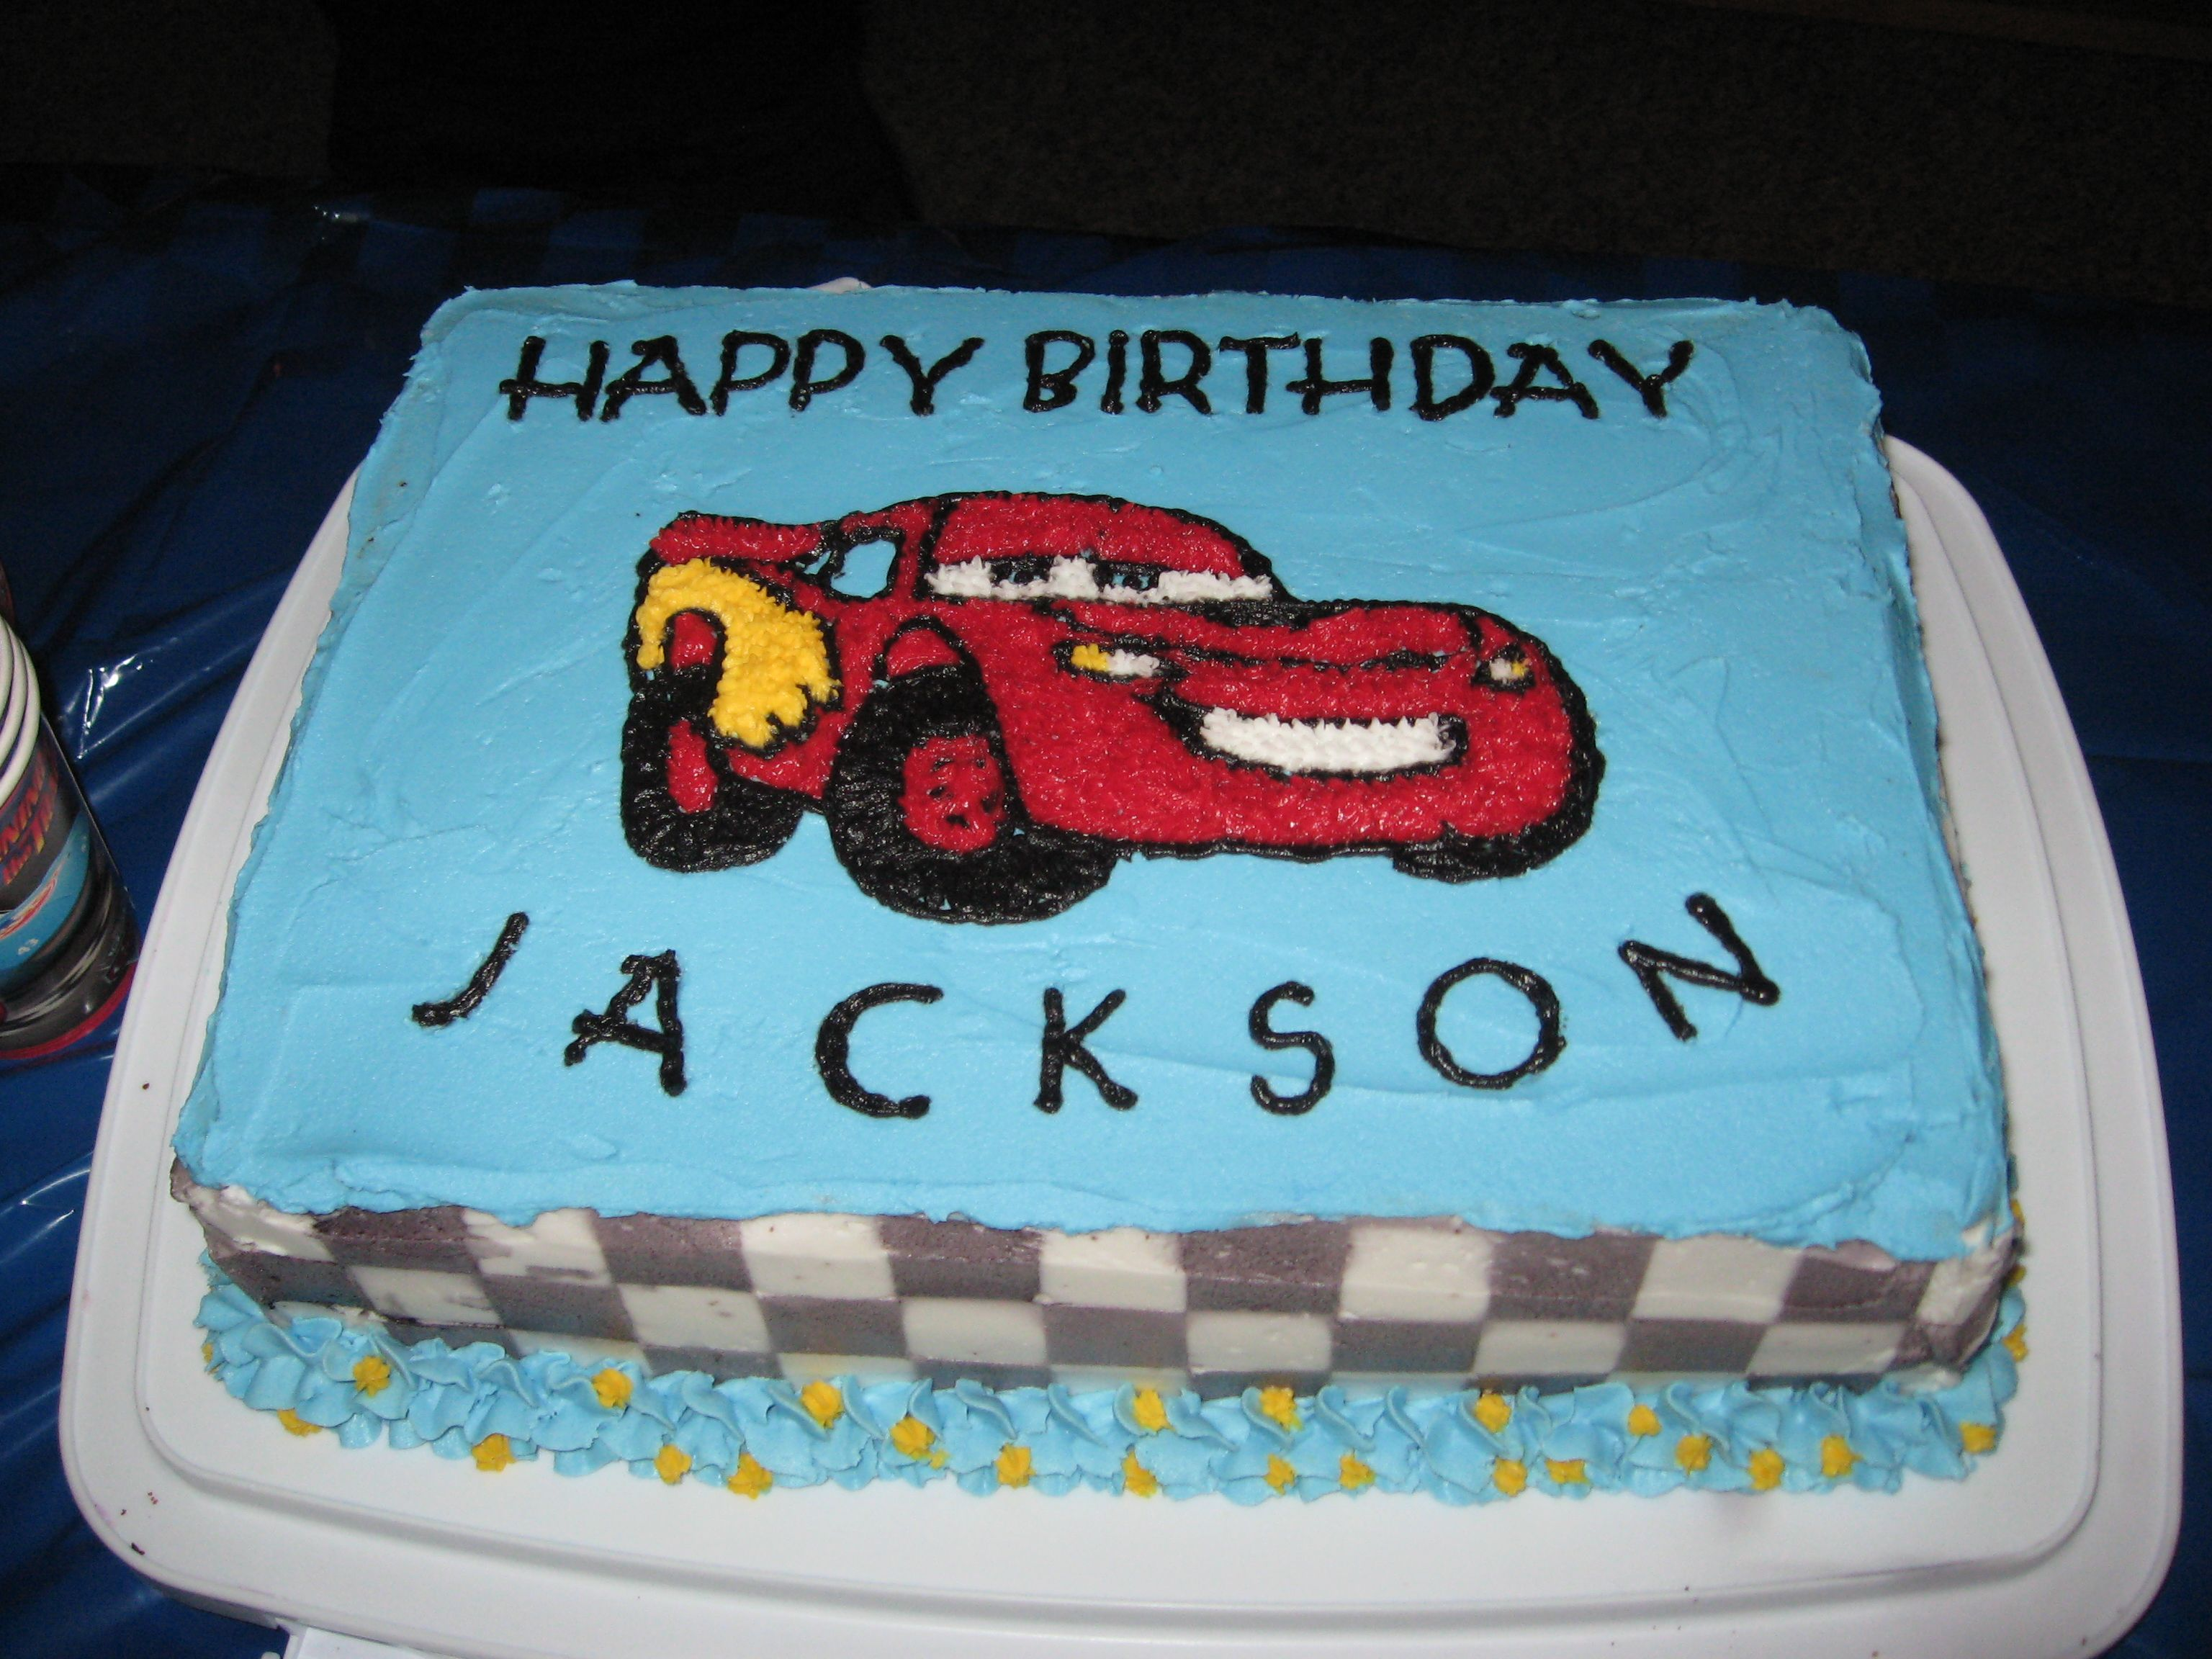 Lightning Mcqueen Birthday Cake Ideas Image Inspiration of Cake